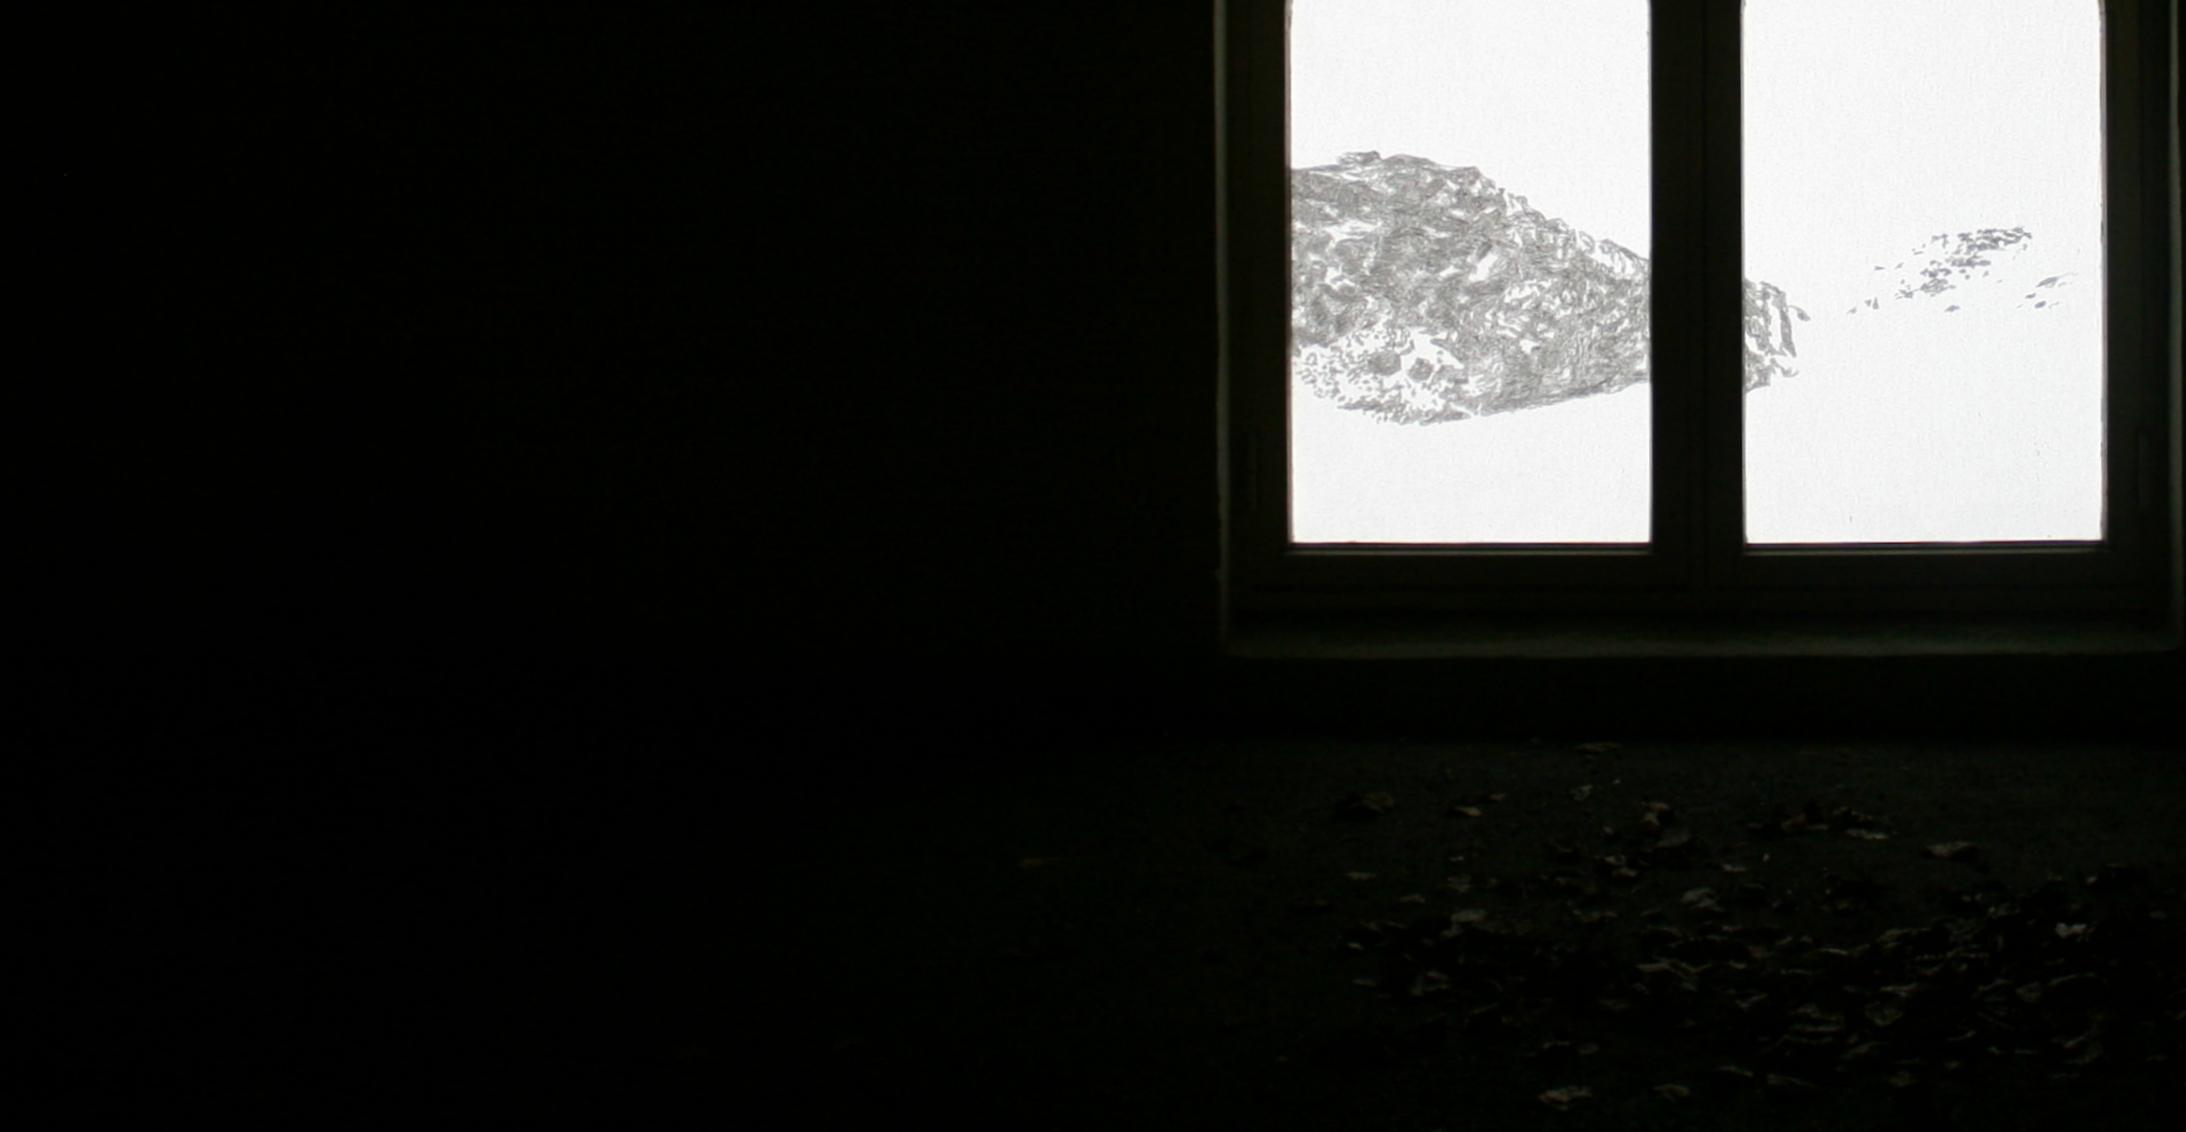 Skade Henriksen – Light is moving / In the silent